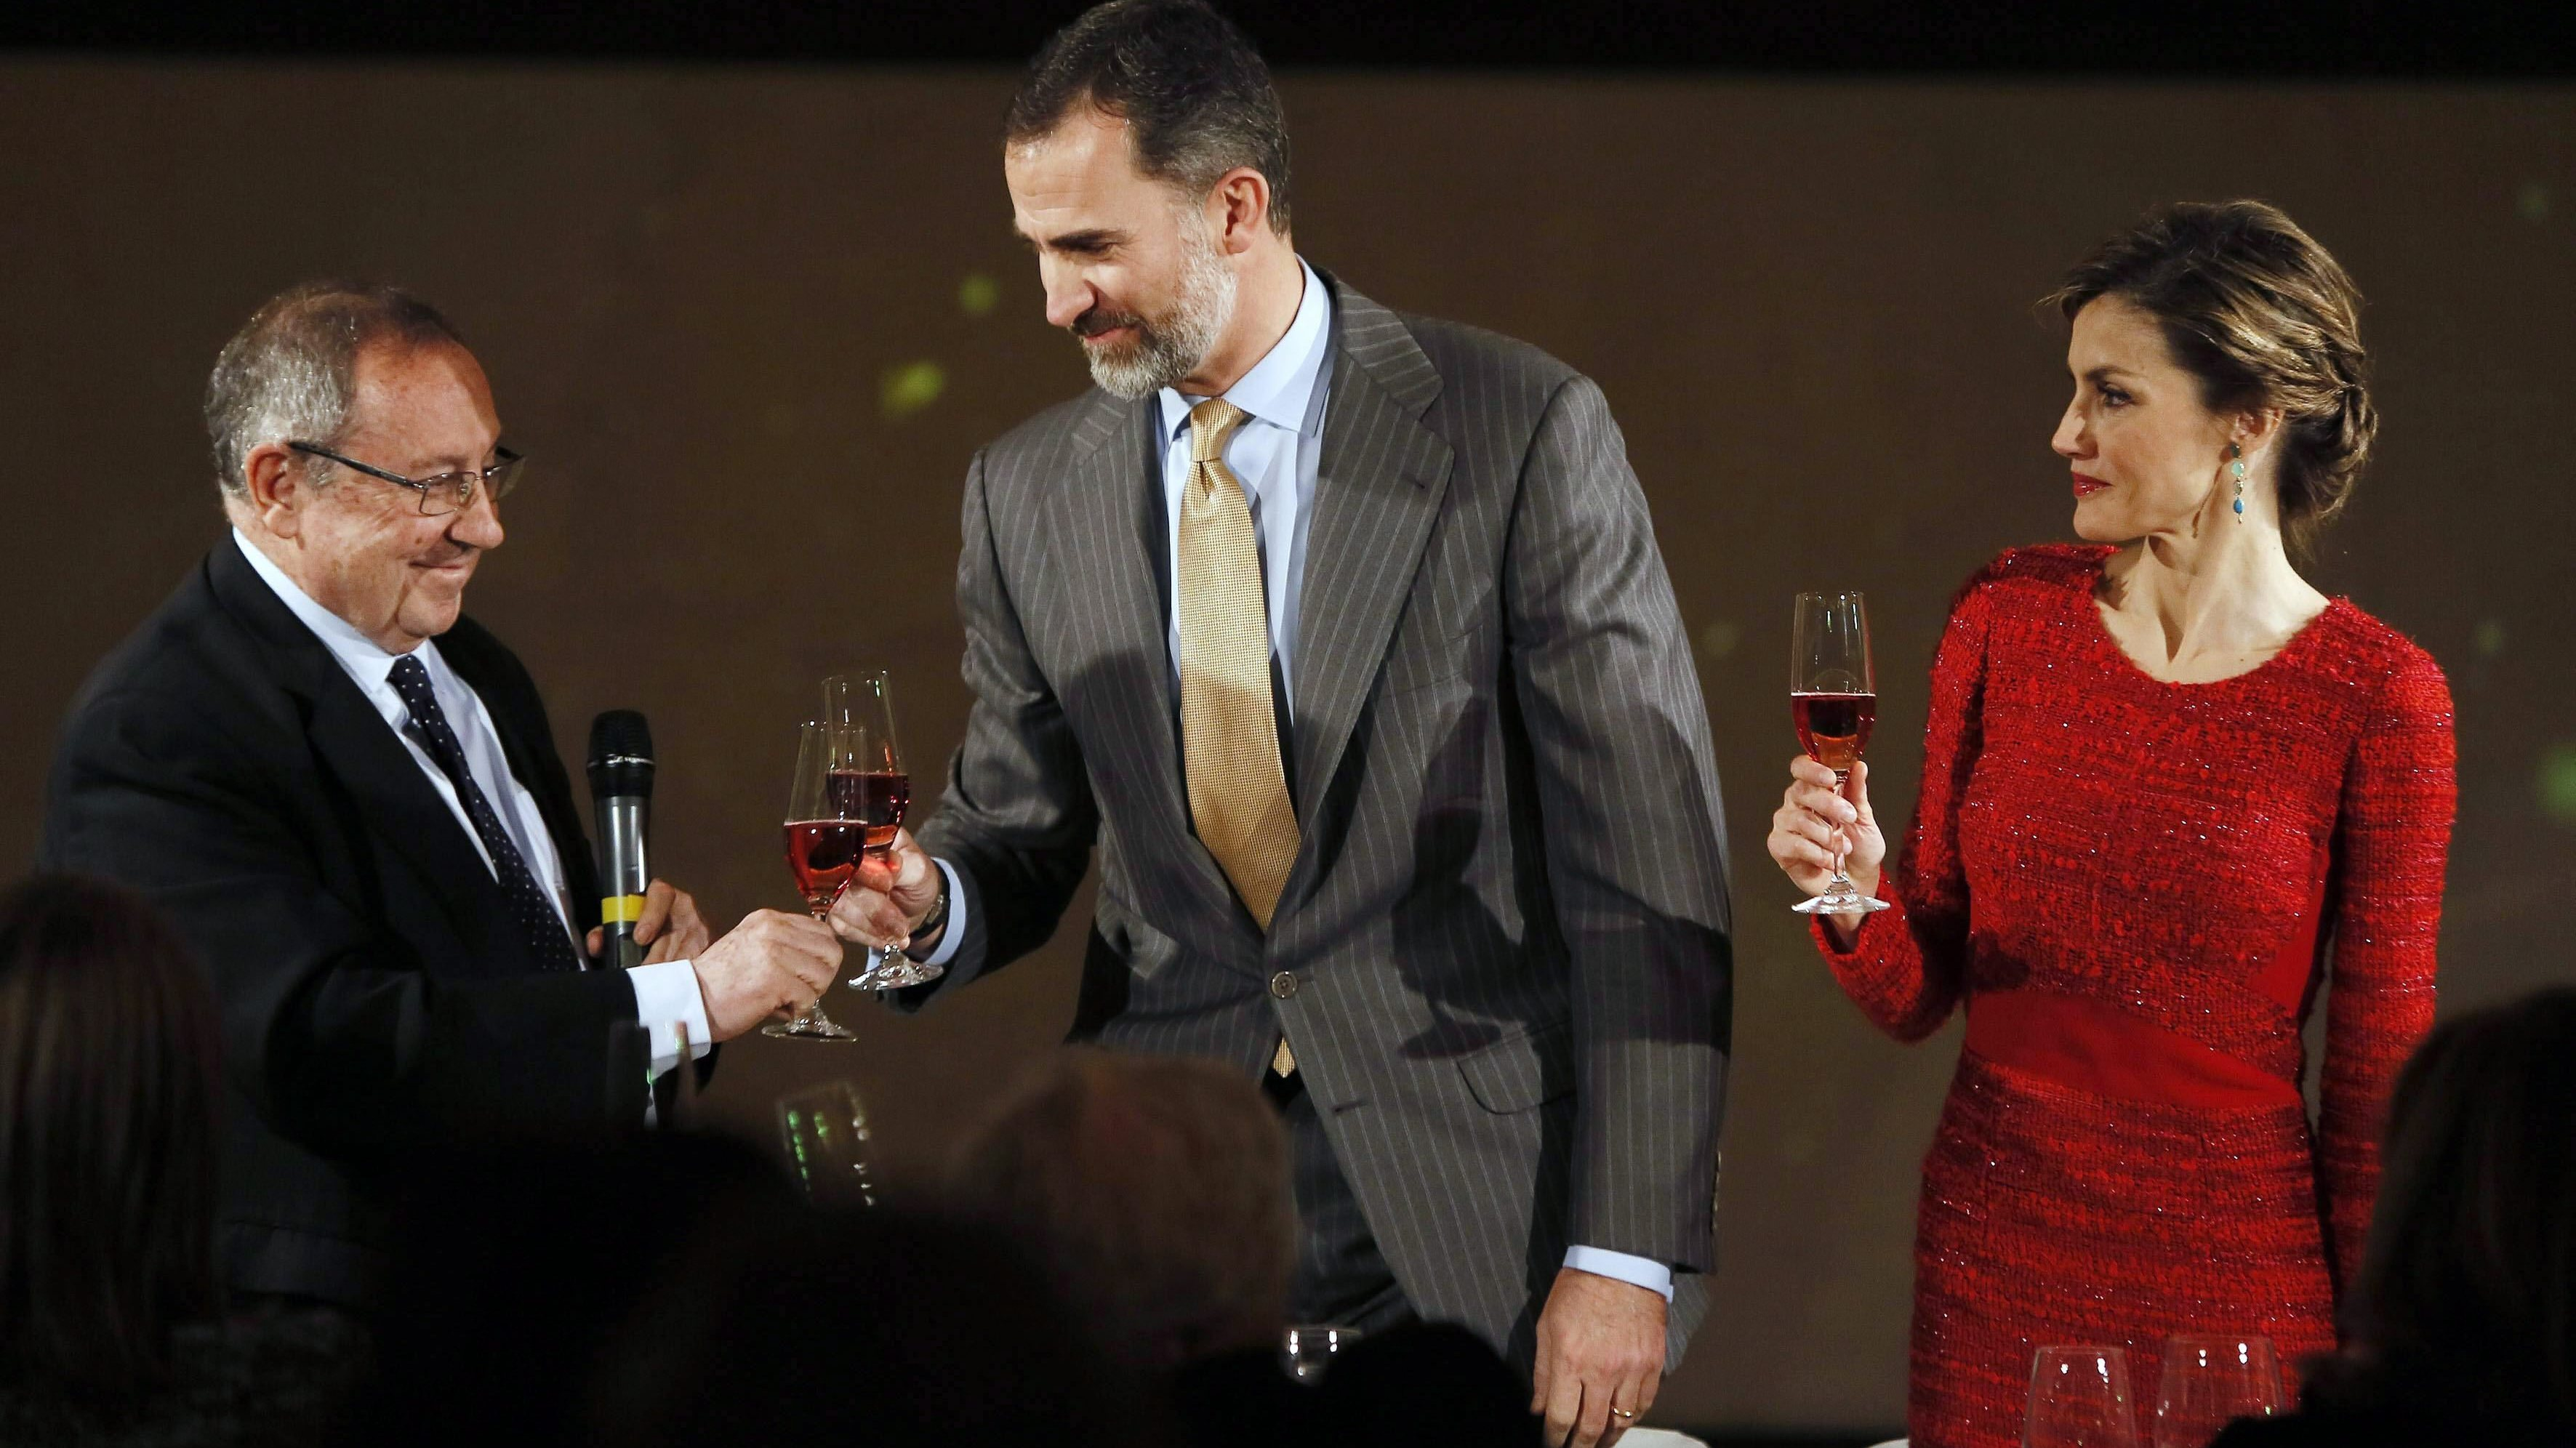 Spain's Wine Exports Soar 22 Percent — But Profits Fall